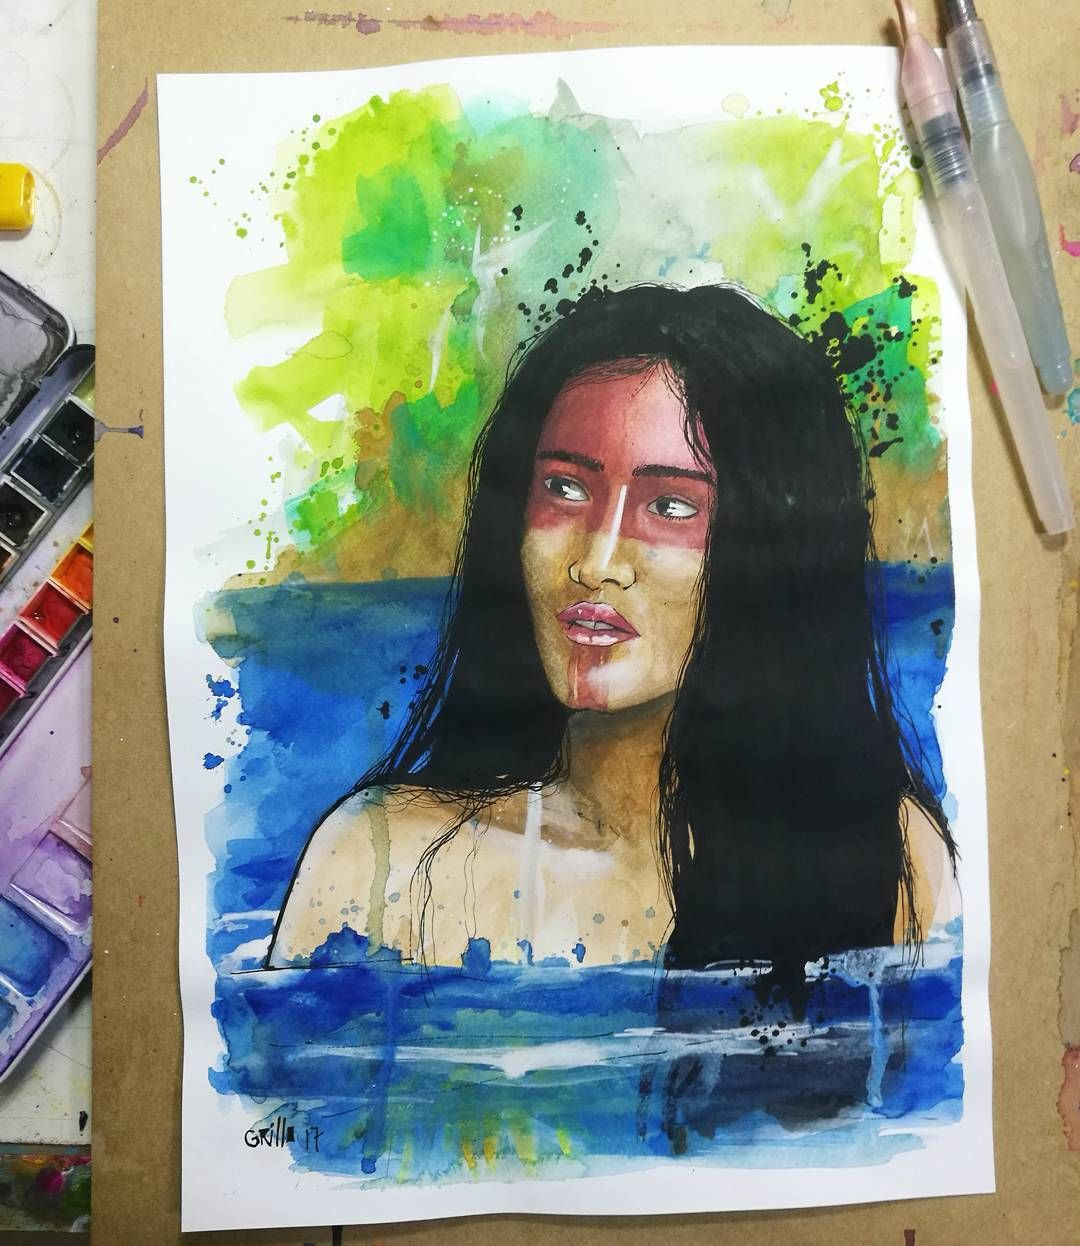 "44 Me gusta, 2 comentarios - Grillo Benitez Balcinha (@grillote69) en Instagram: ""#watercolorpainting #watercolor #acuarelas #paraguay #nativa #mujernativa #guaraní"""